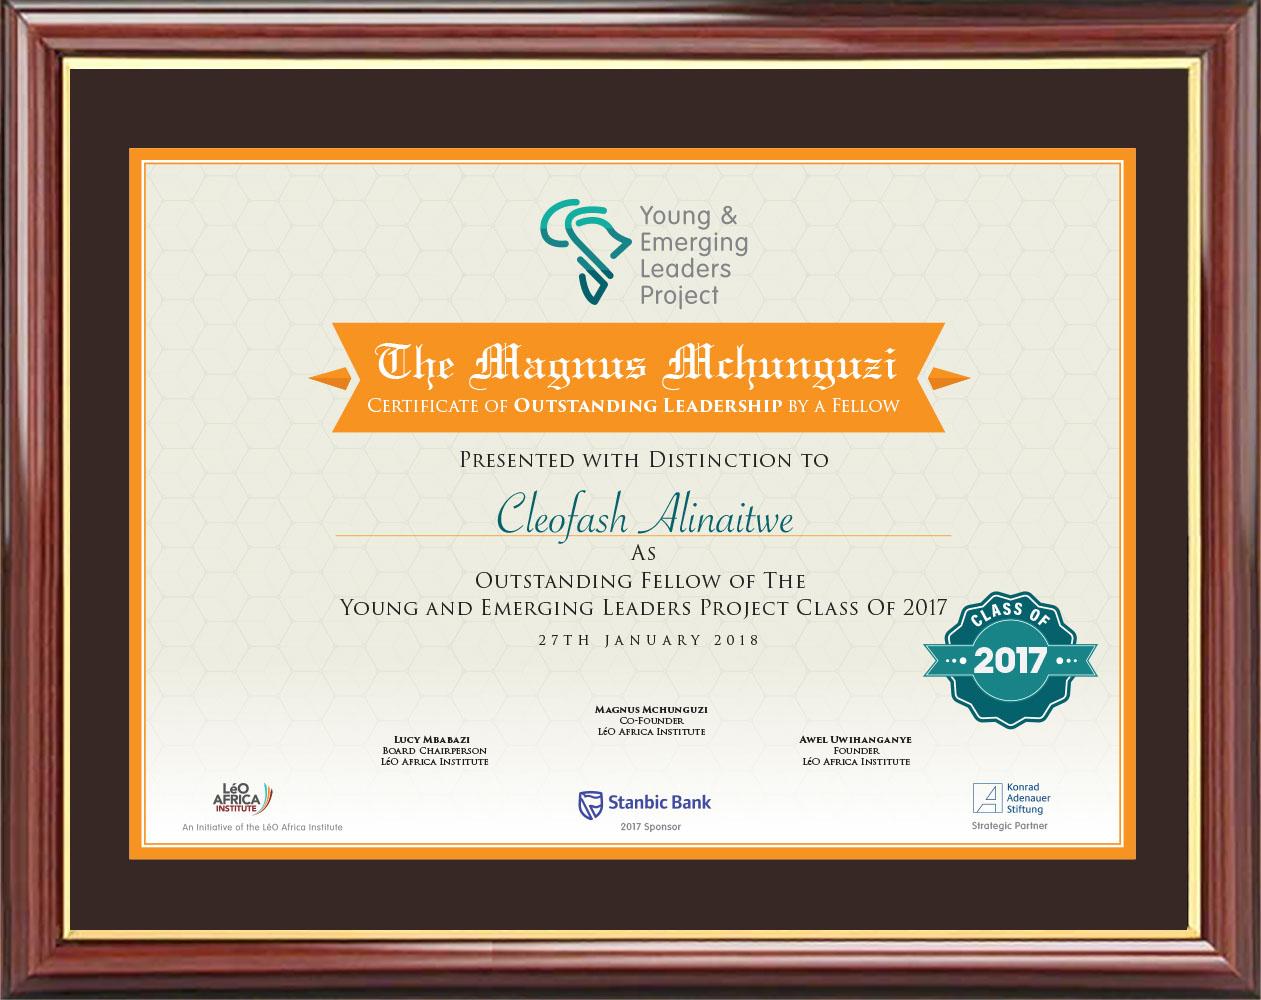 The Magnus Mchunguzi Certificate.